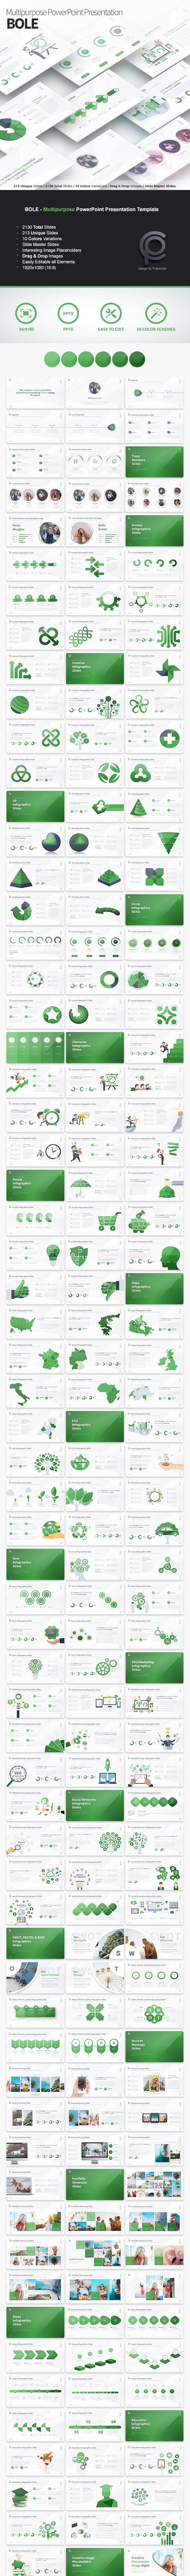 Bole - Multipurpose PowerPoint Presentation - Business PowerPoint Templates